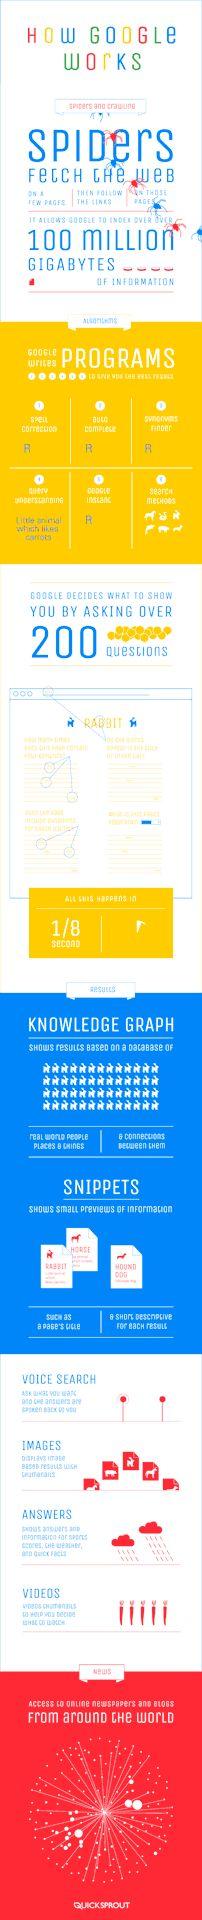 Background image SEO Marketing Services, Website Designing & Hosting, online shopping services